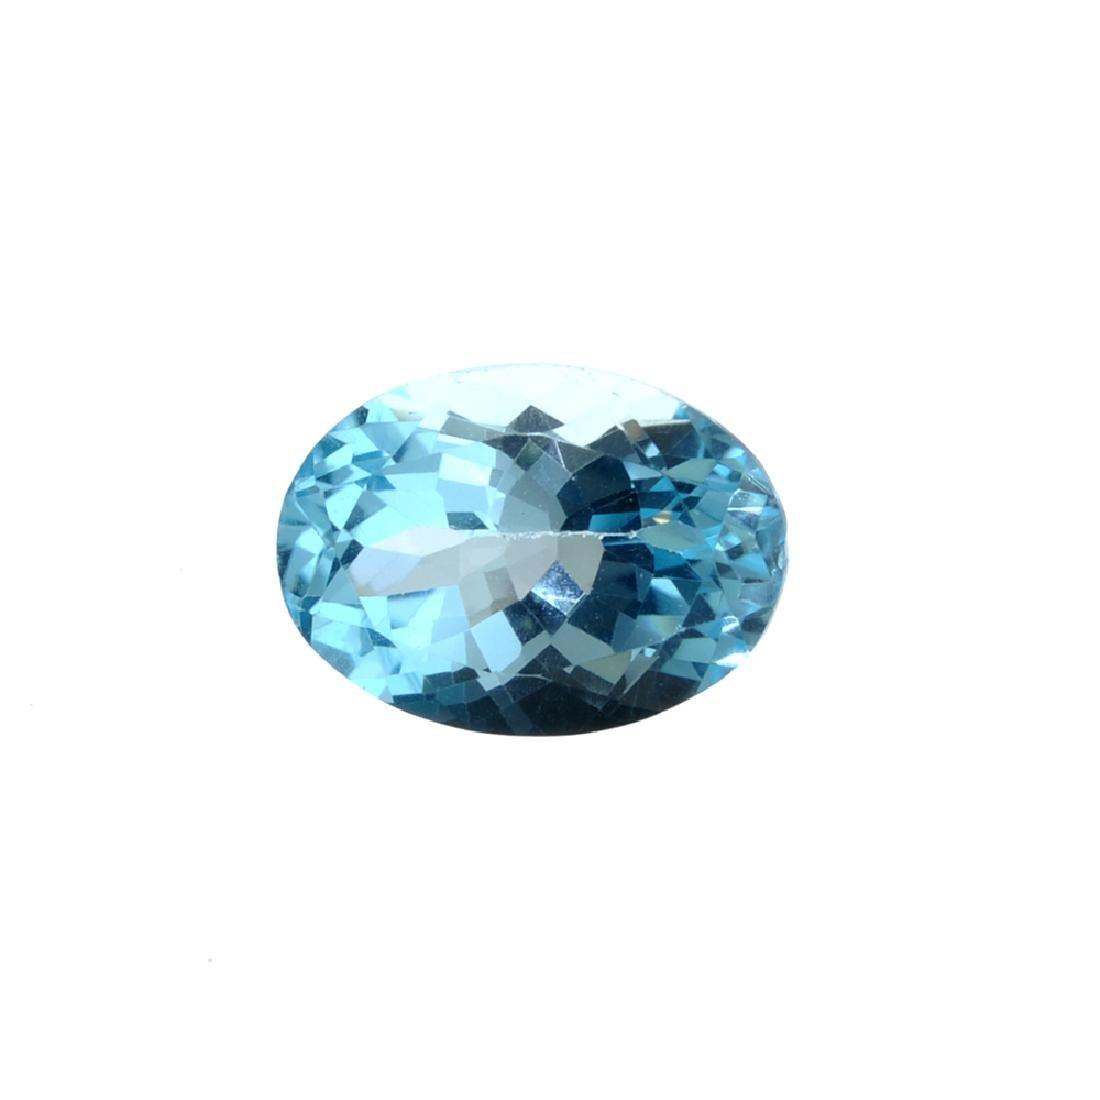 APP: 0.5k 18.02CT Oval Cut Blue Topaz Gemstone